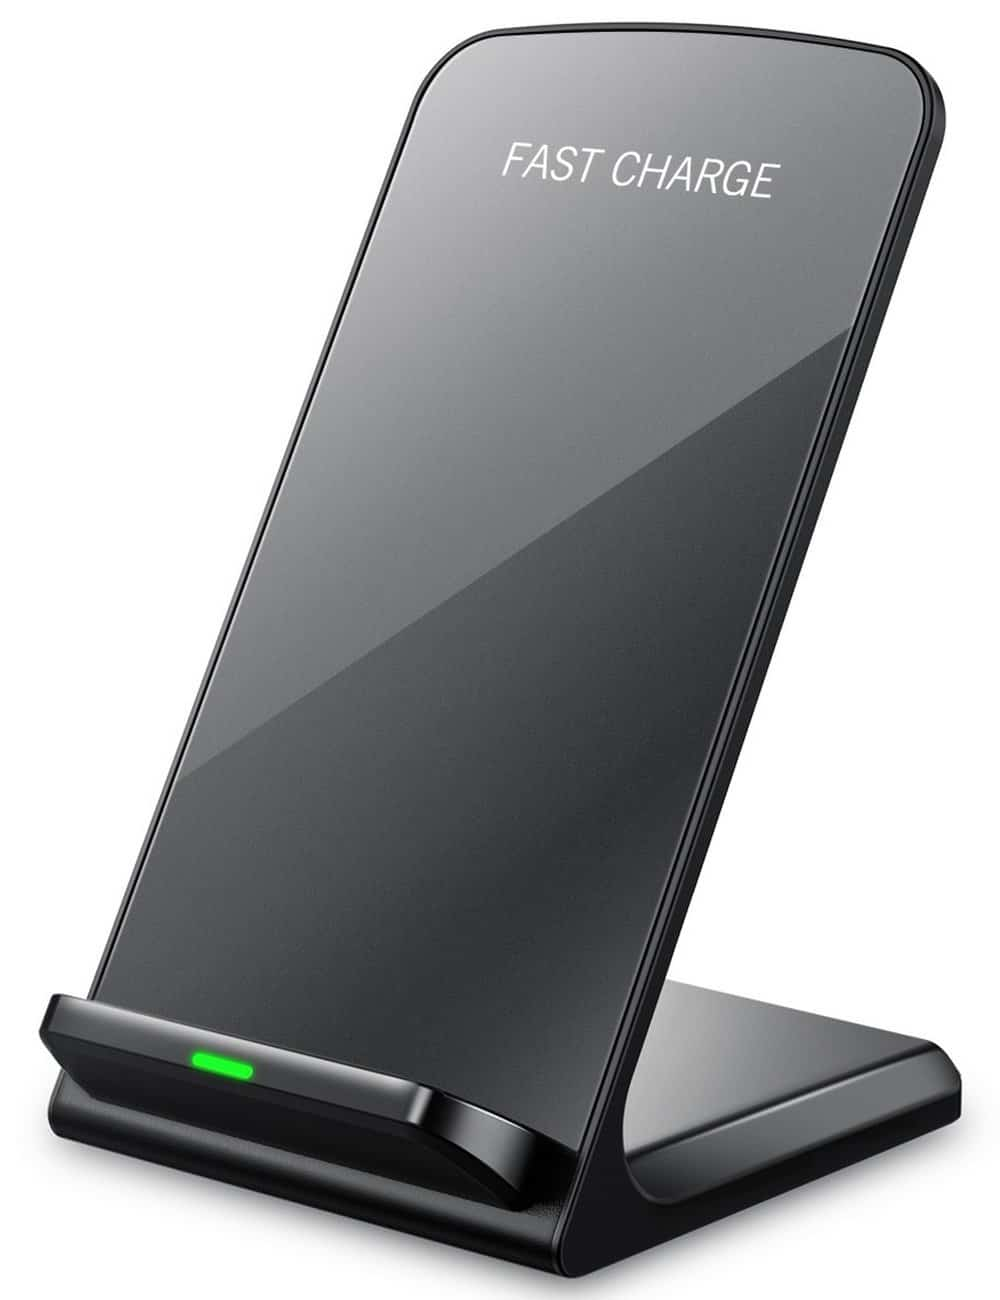 Seneo 10W Fast Wireless Charger